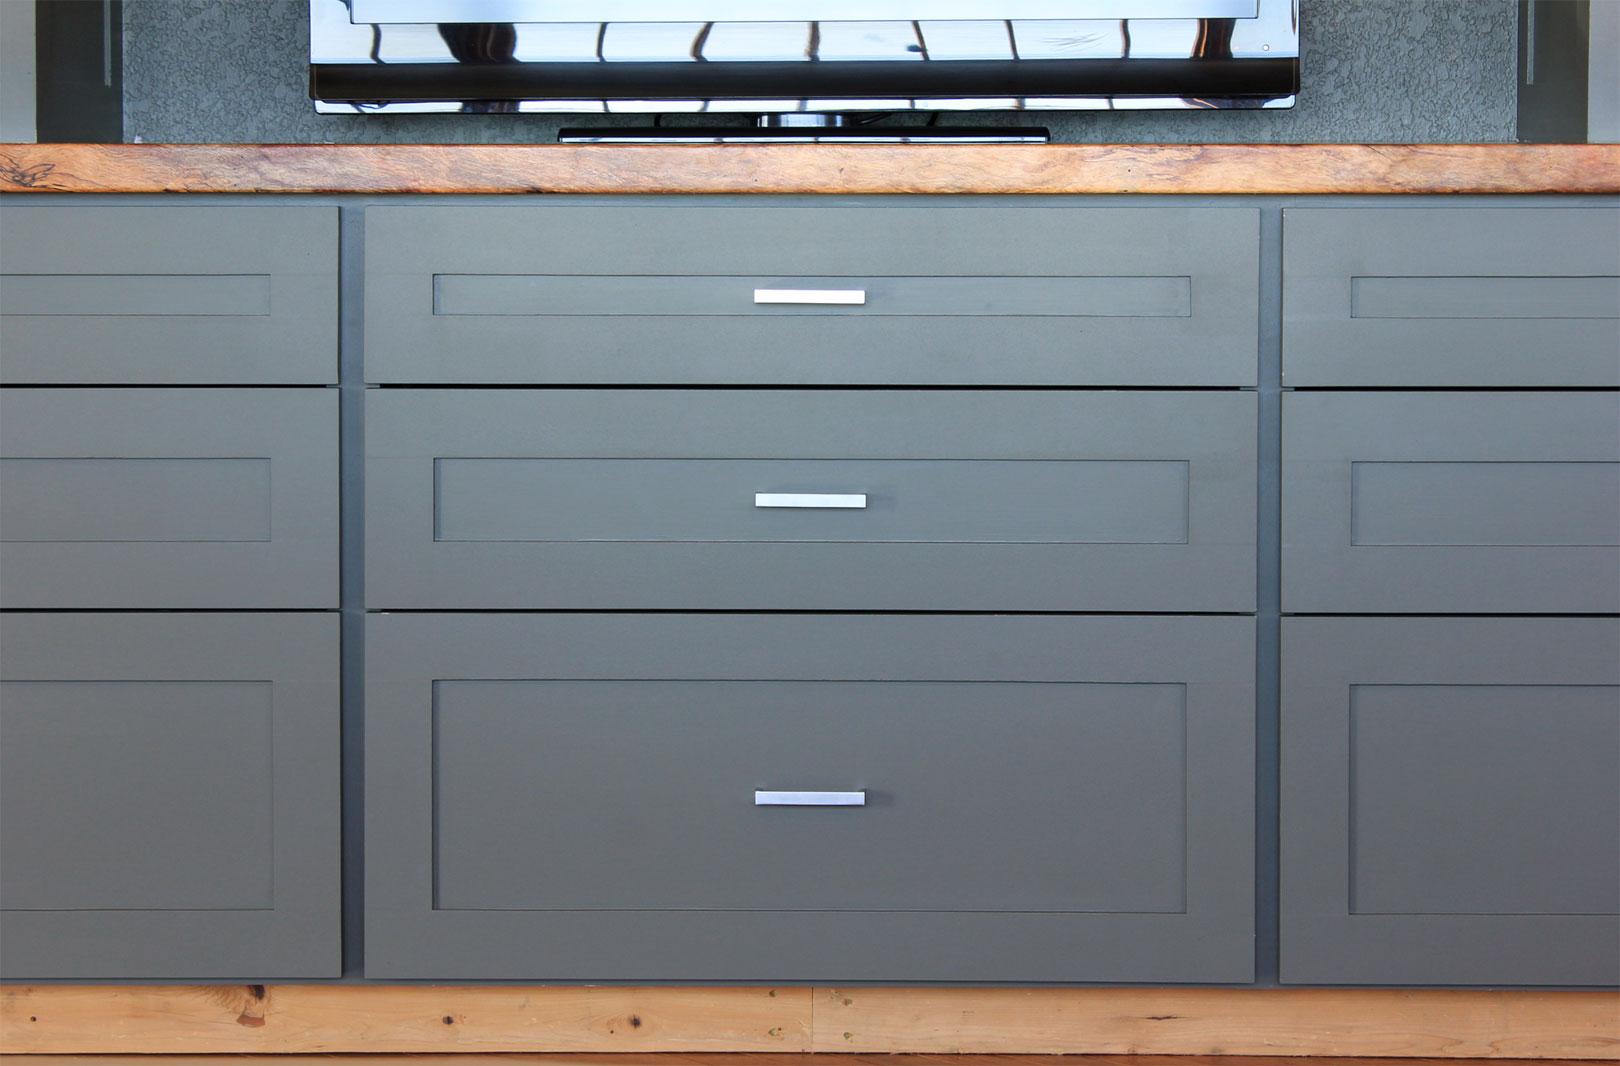 entertainment center drawer front detail. Black Bedroom Furniture Sets. Home Design Ideas